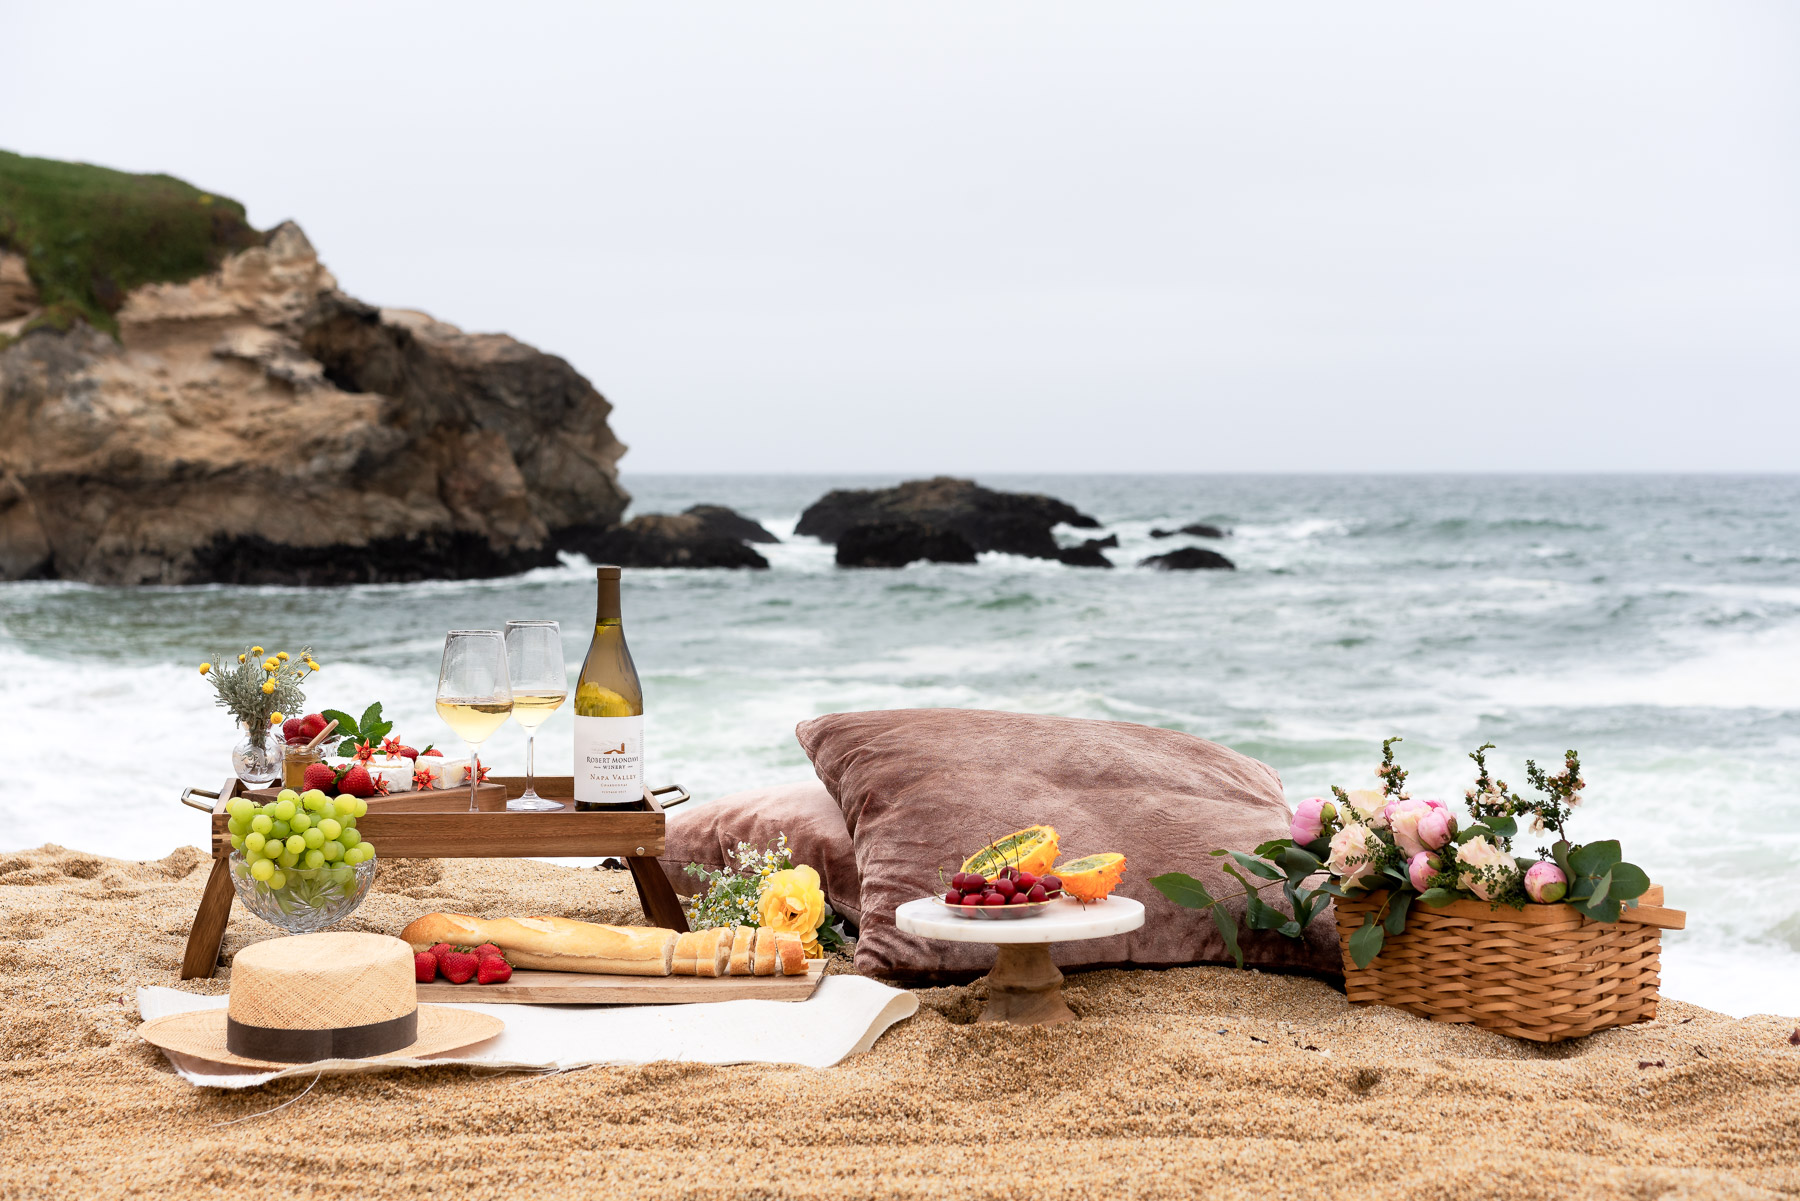 robert-mondavi-beach-picnic.jpg